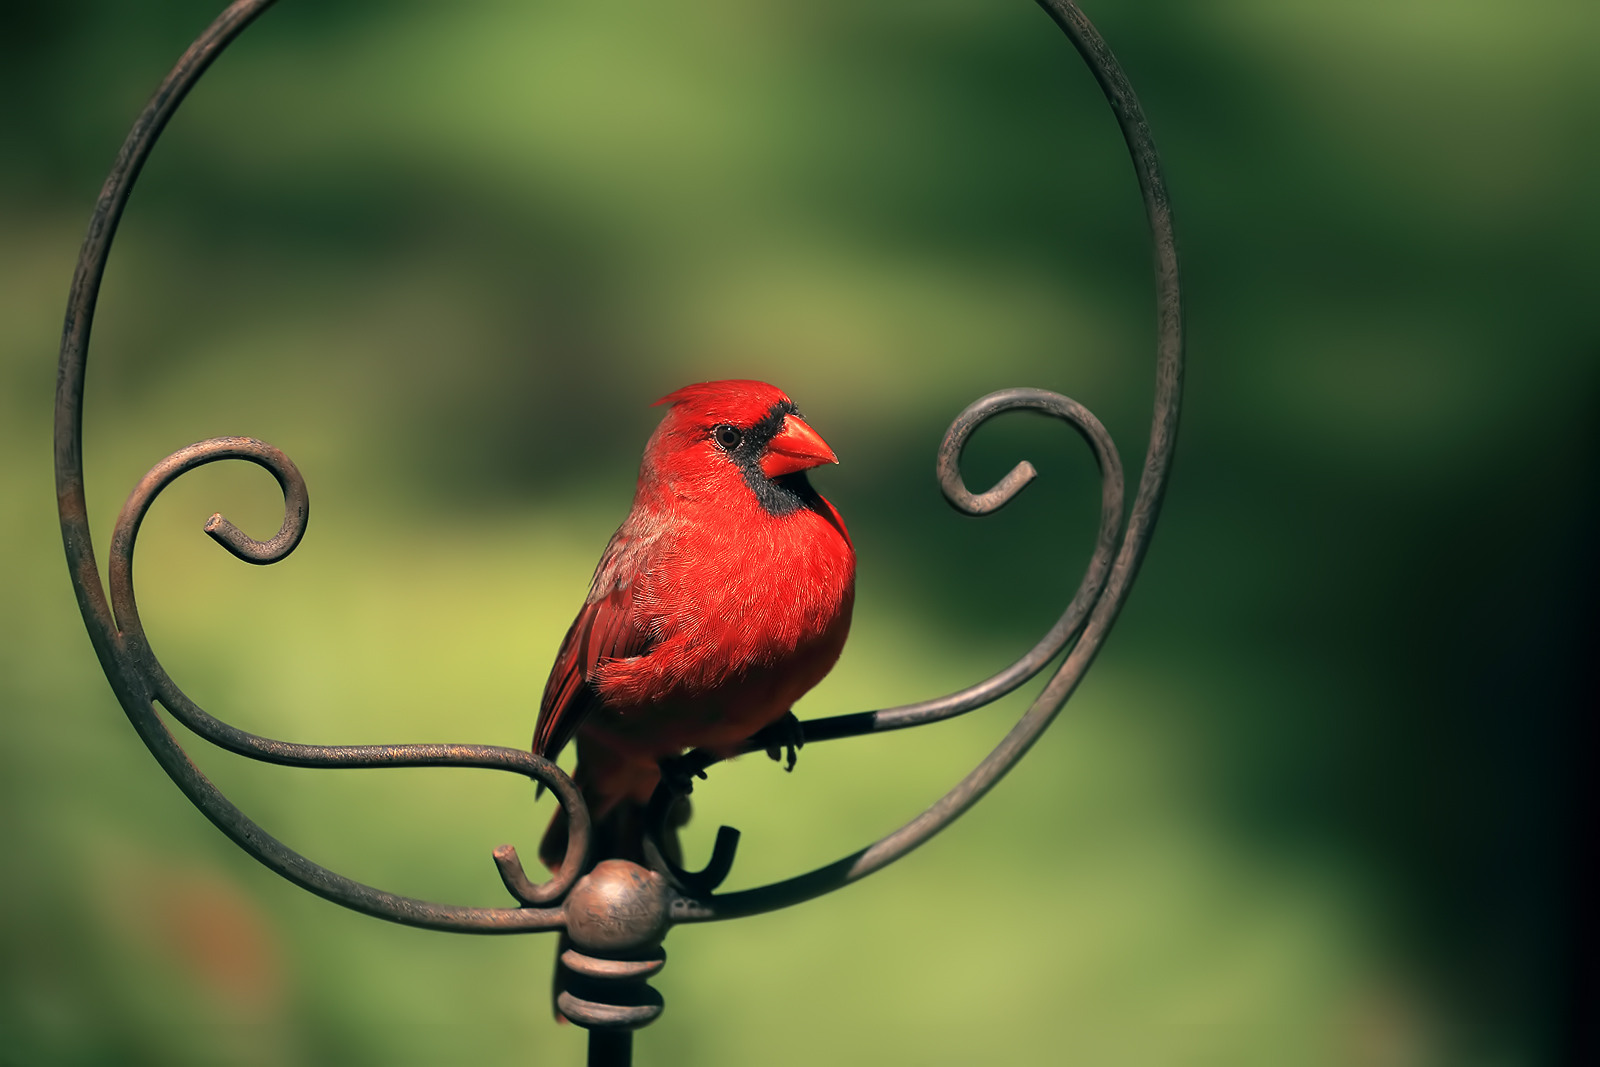 Northern Cardinal by Linn Smith